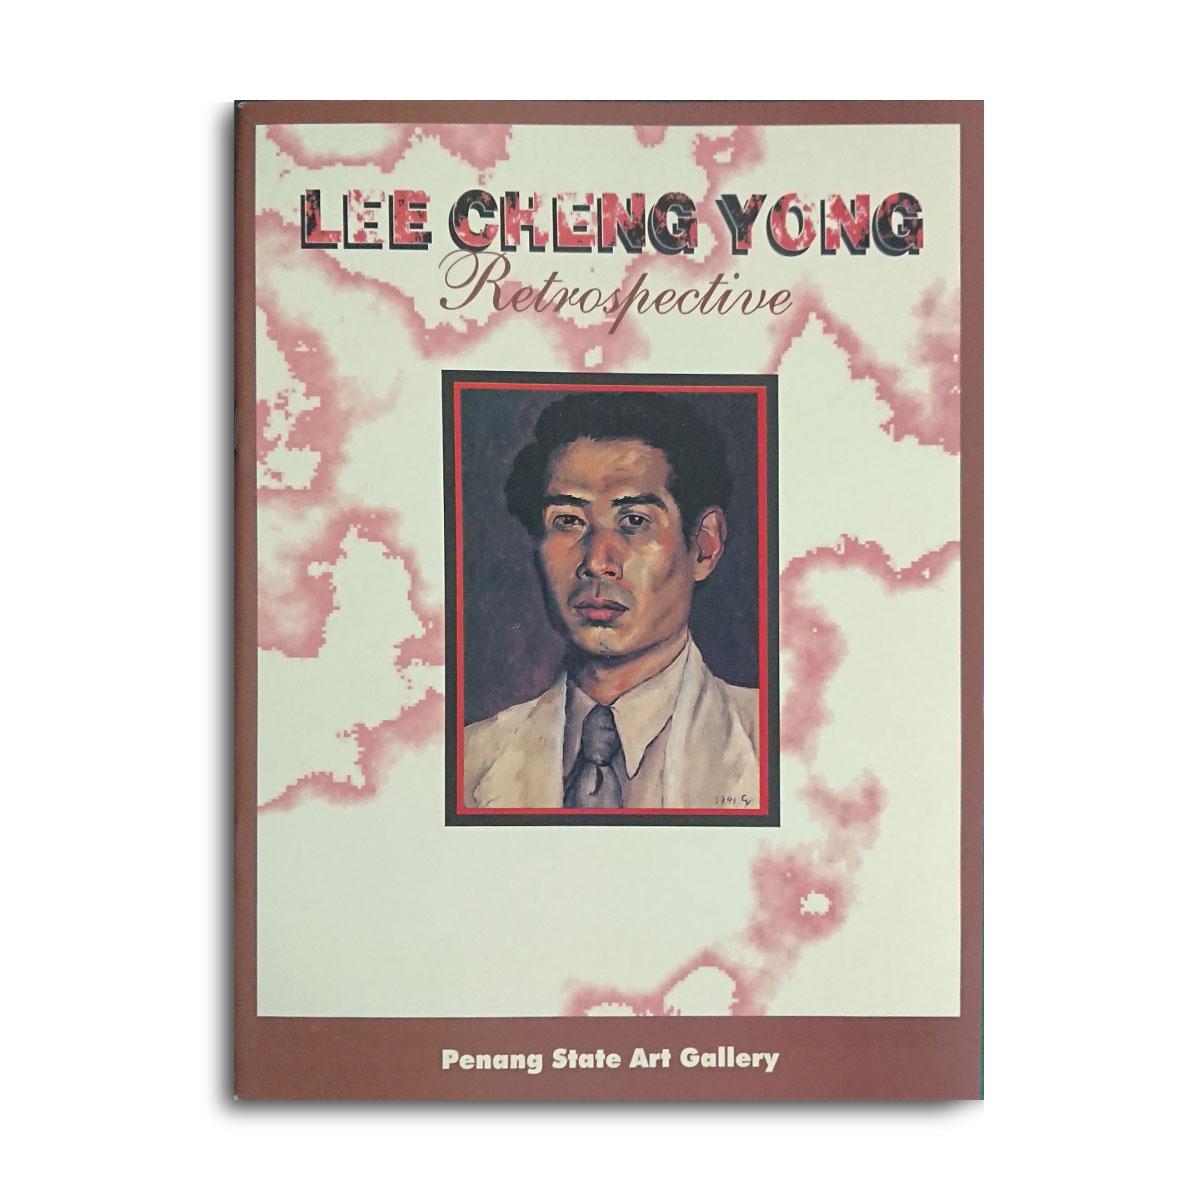 Lee Cheng Yong - Retrospective